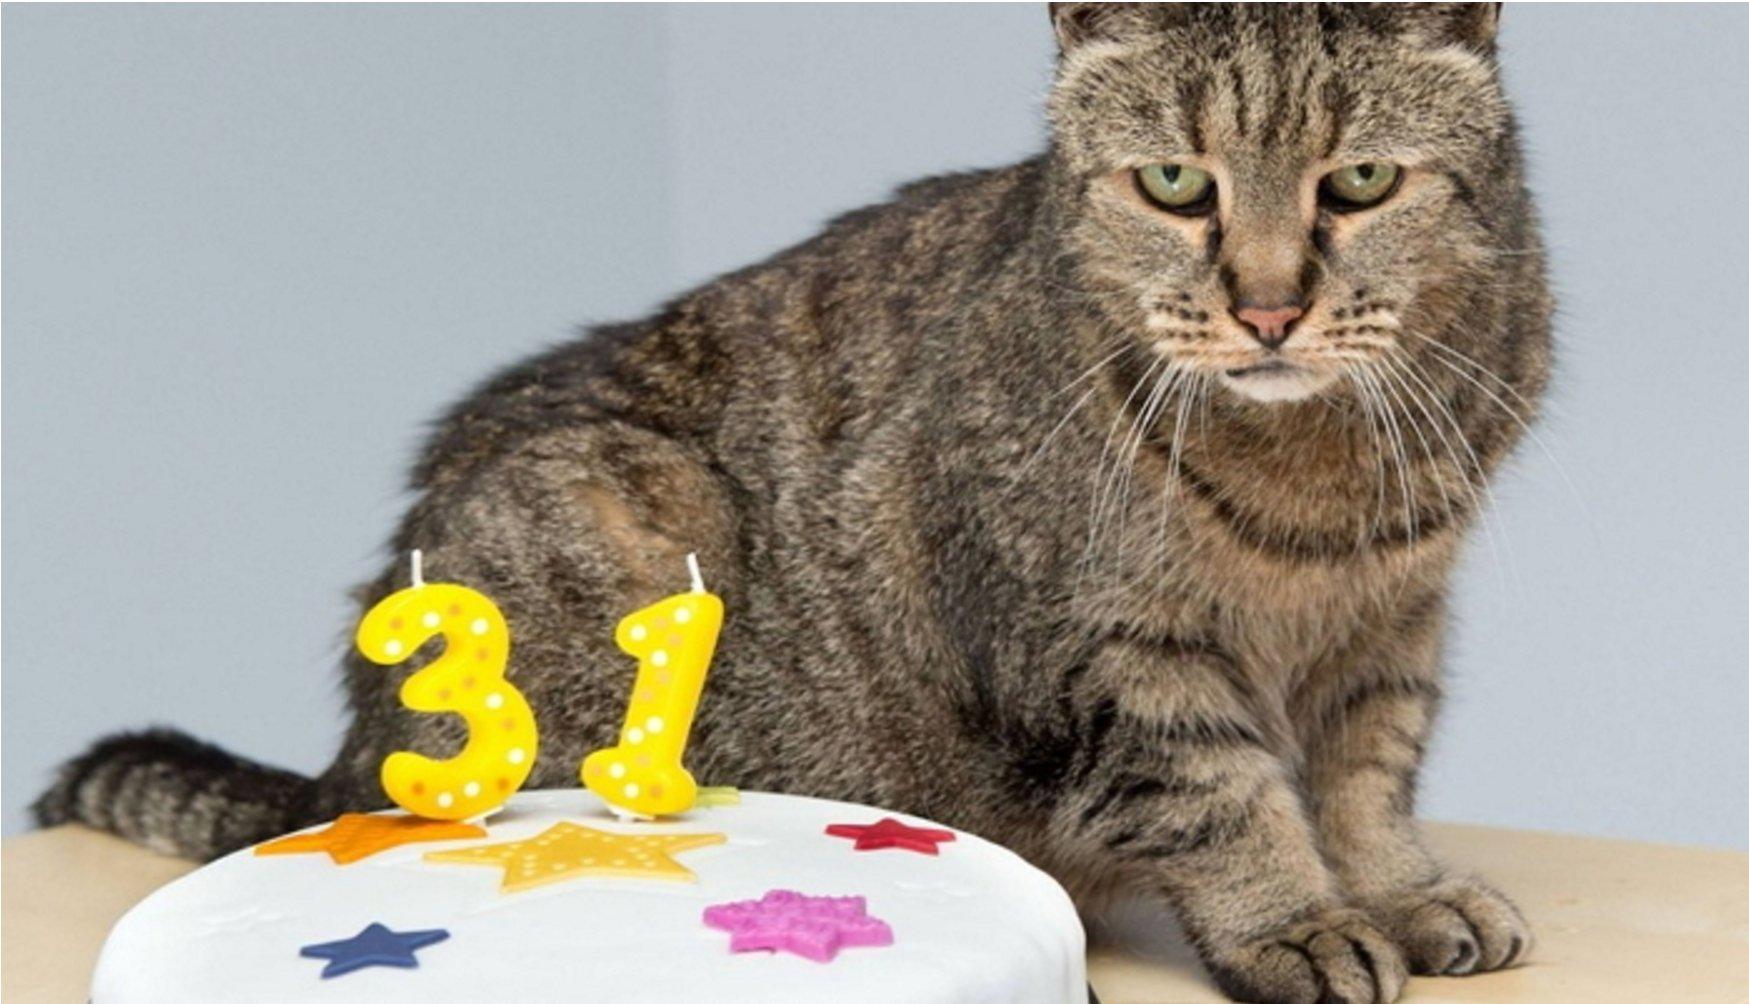 mirror - 생일 맞은 31살 고양이... '못마땅한 표정'을 짓는 이유는?